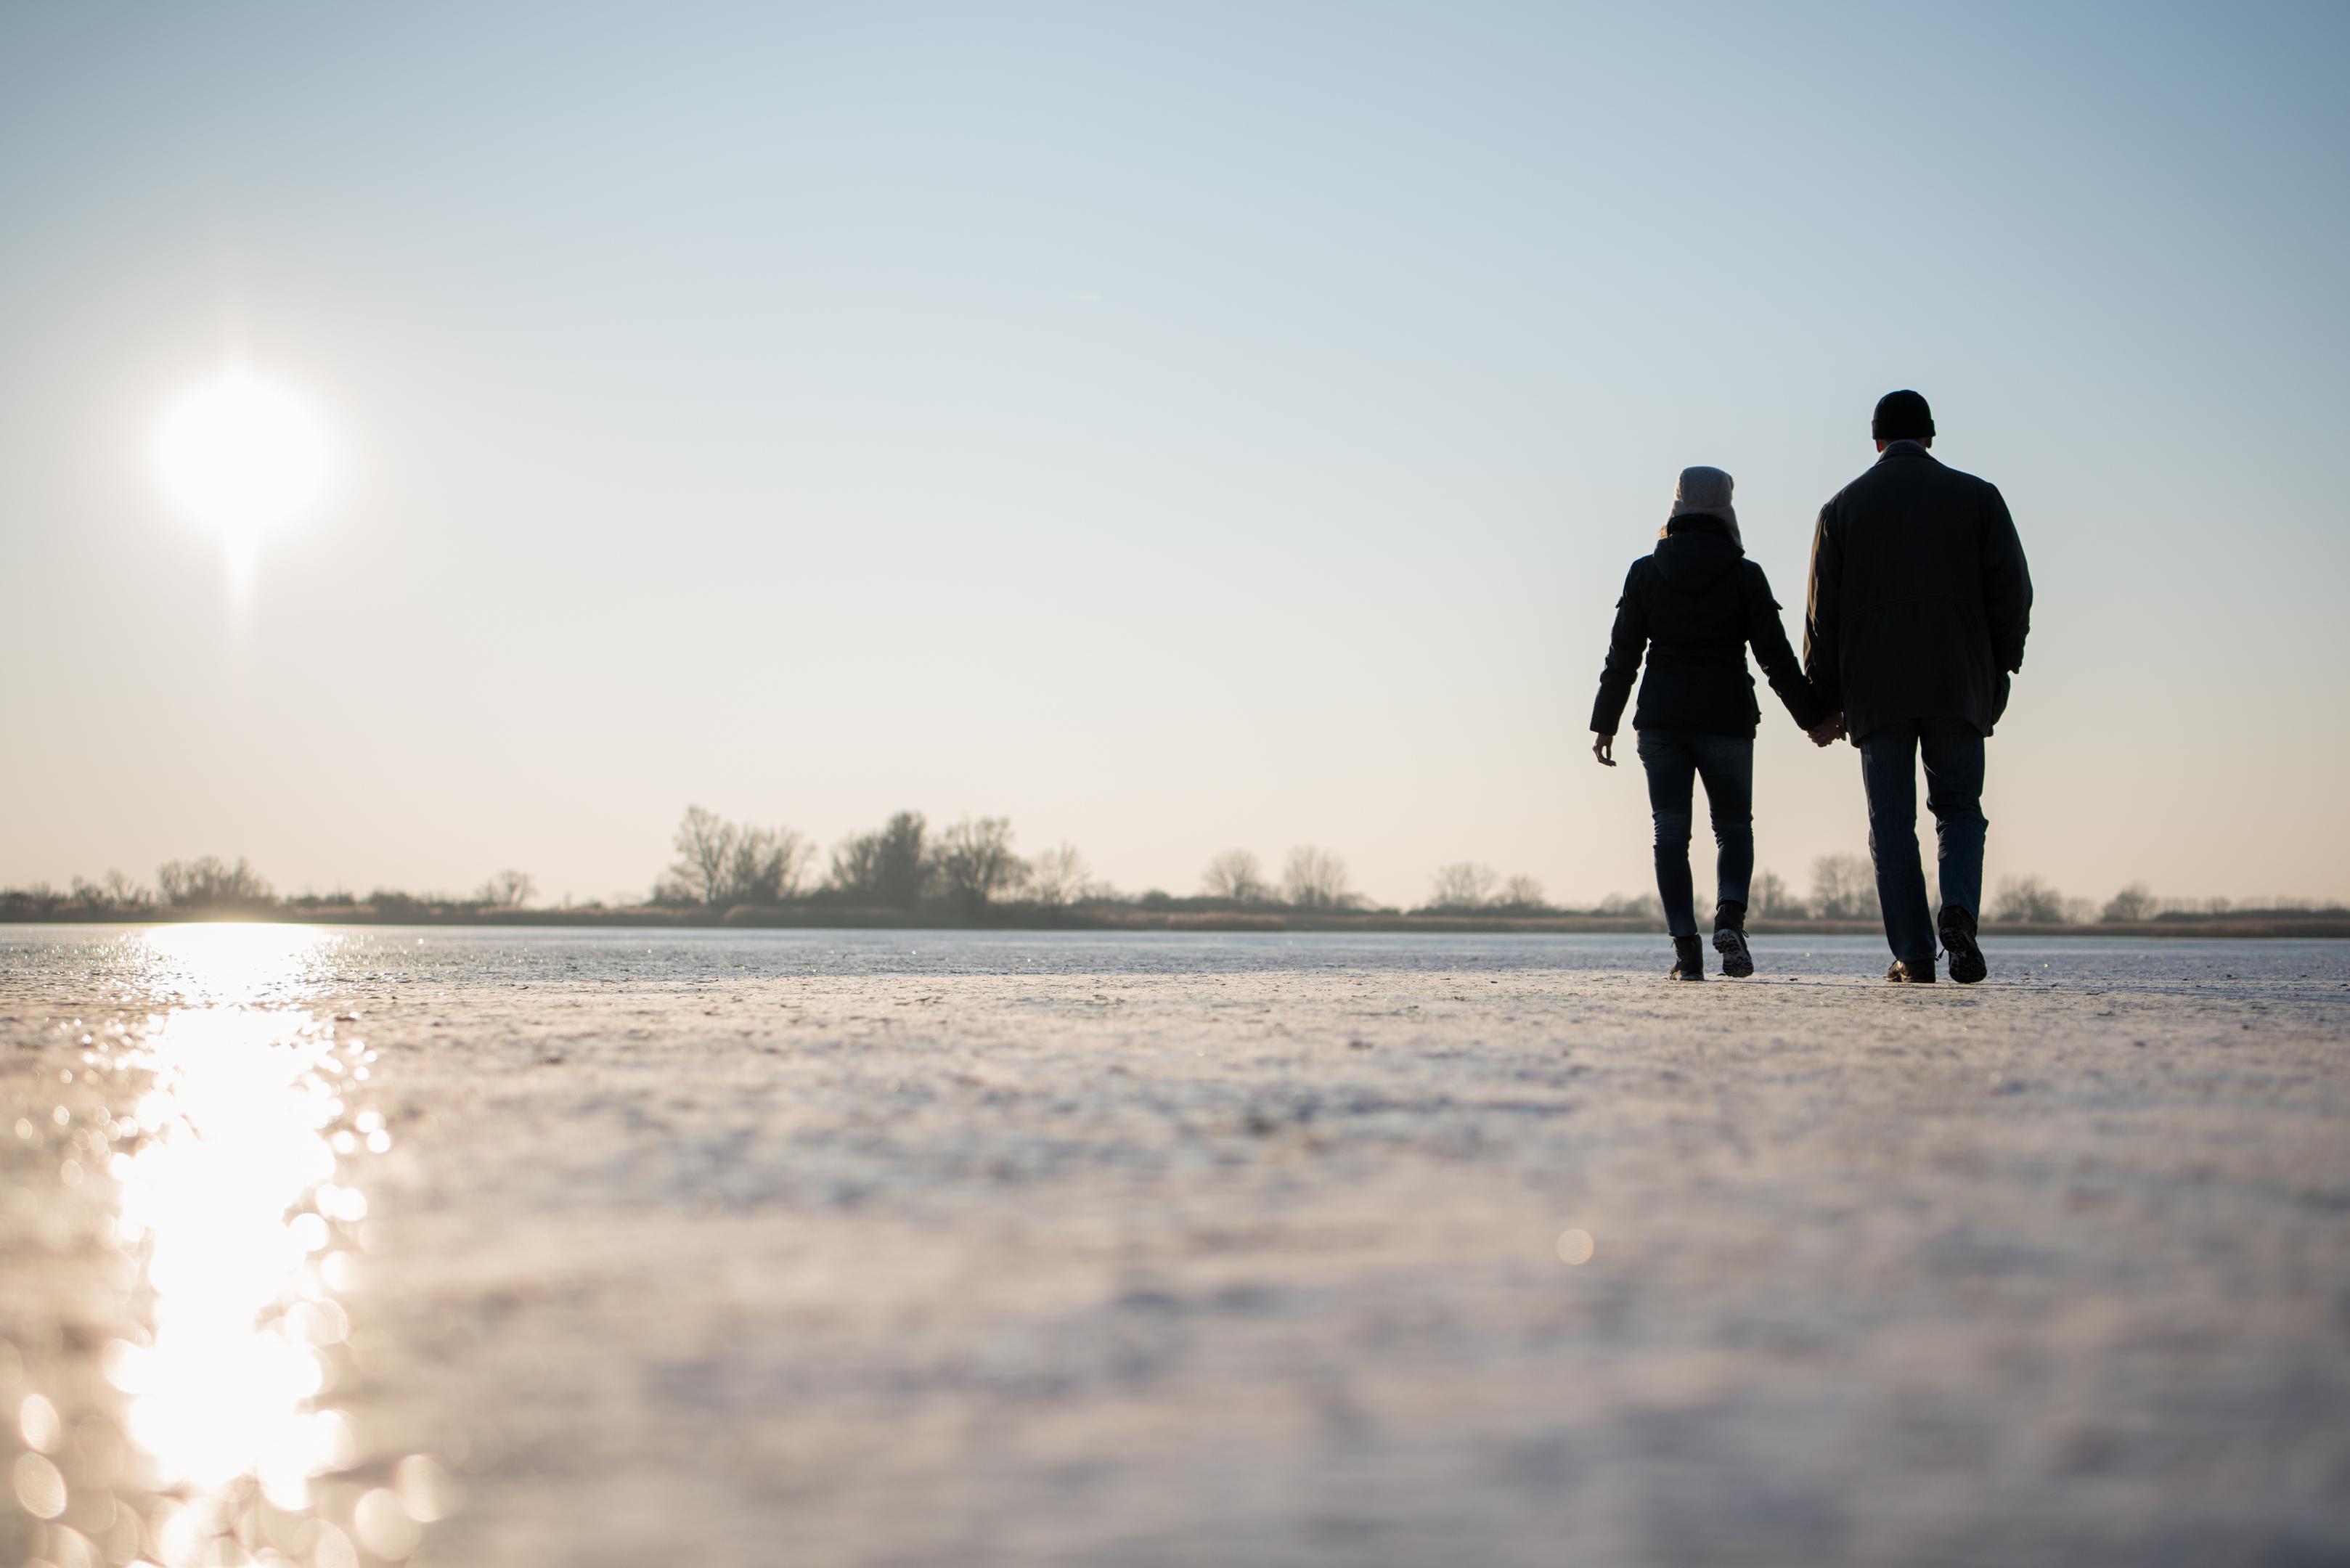 Storyteller Matt Hopwood has walked 500 miles in search of love stories (Getty Images/iStock)